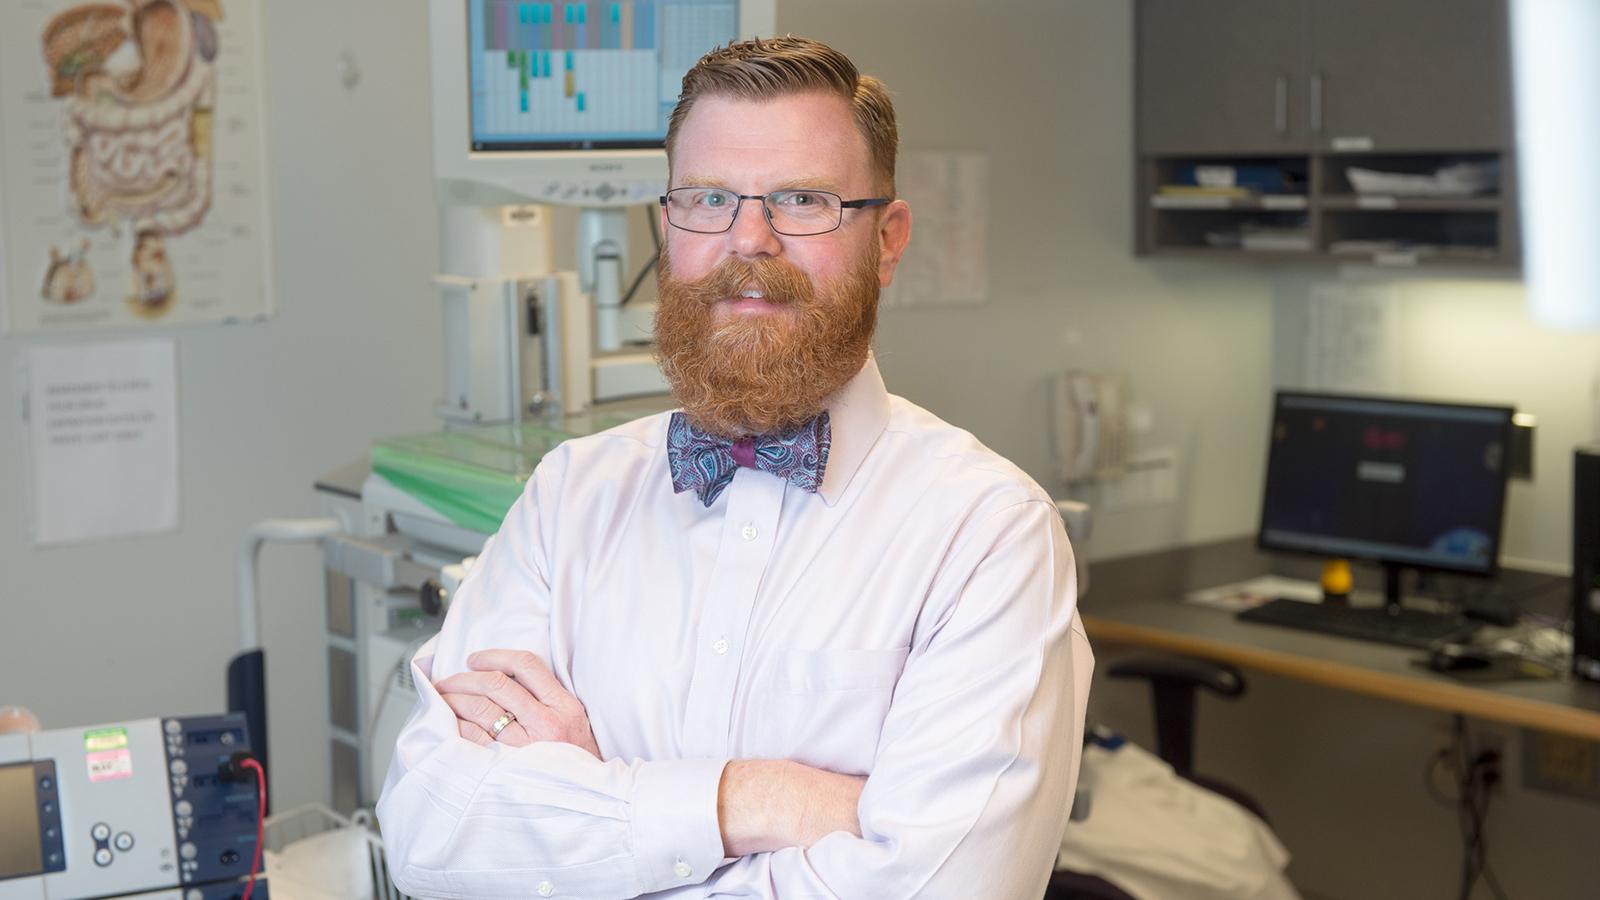 Patrick Green, MD